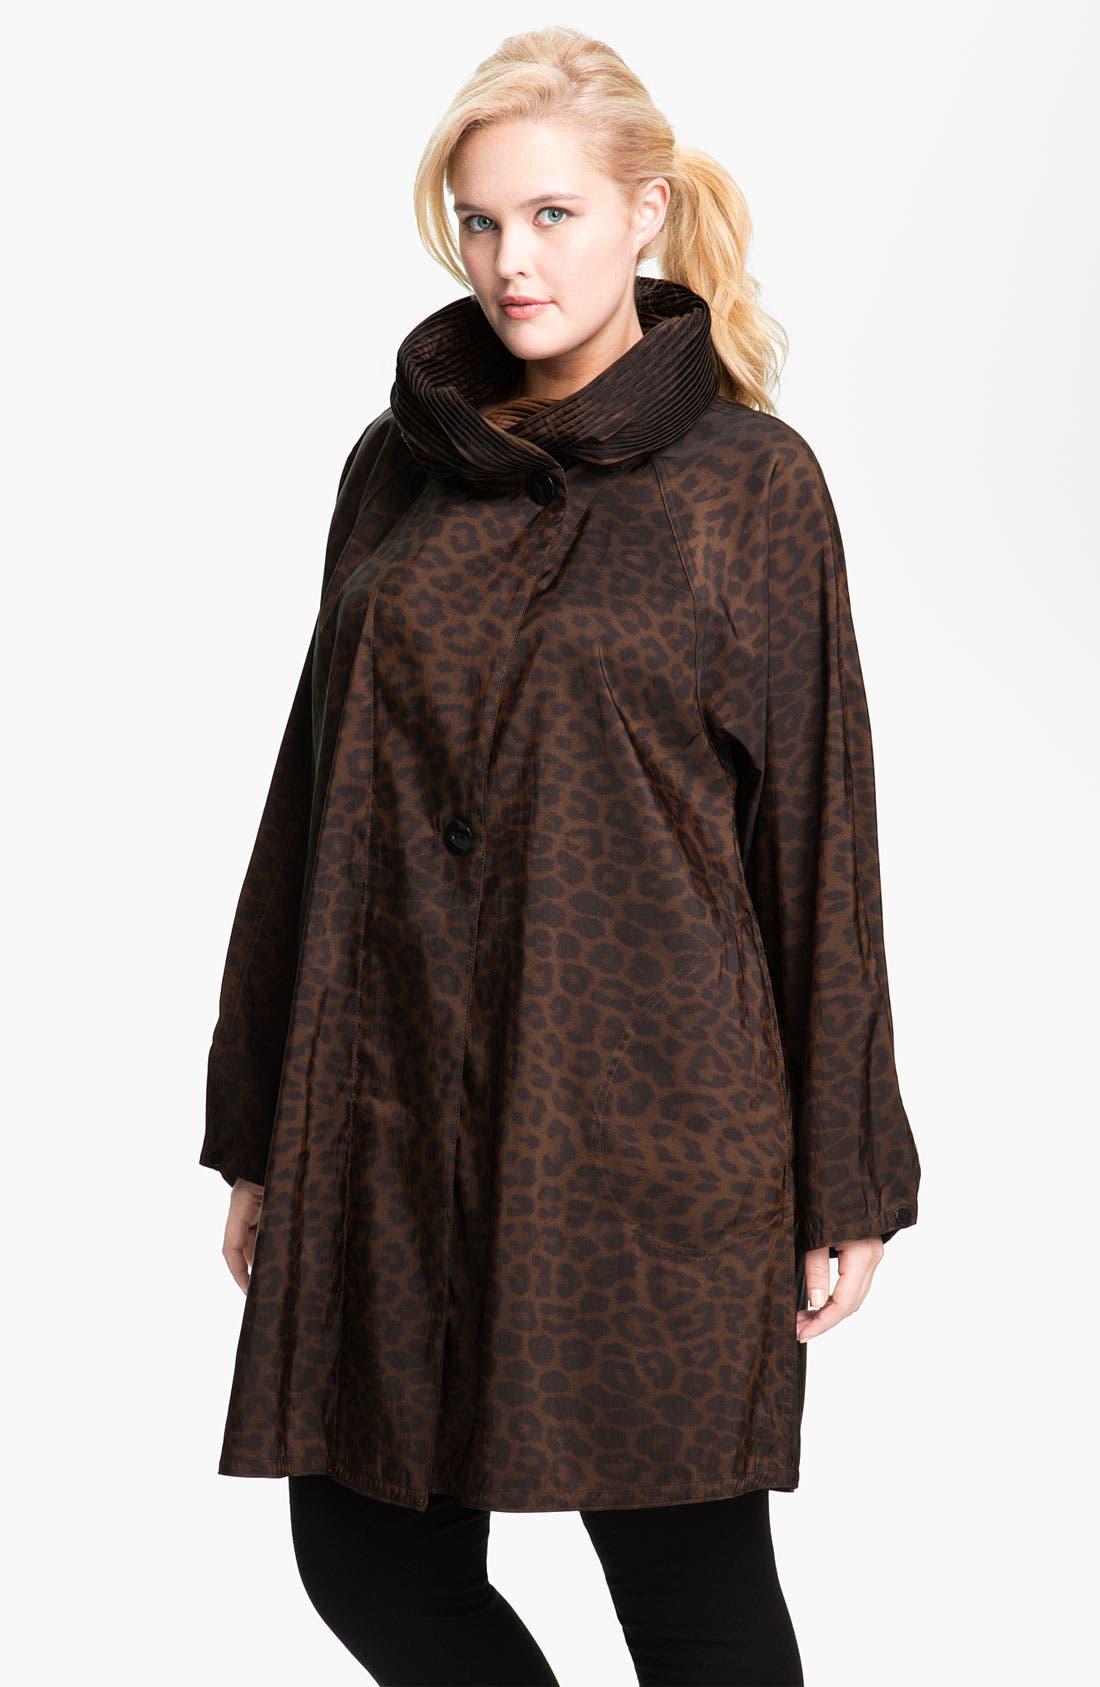 Main Image - Mycra Pac Designer Wear 'Donatella' Scrunch Neck Travel Coat (Regular & Plus)